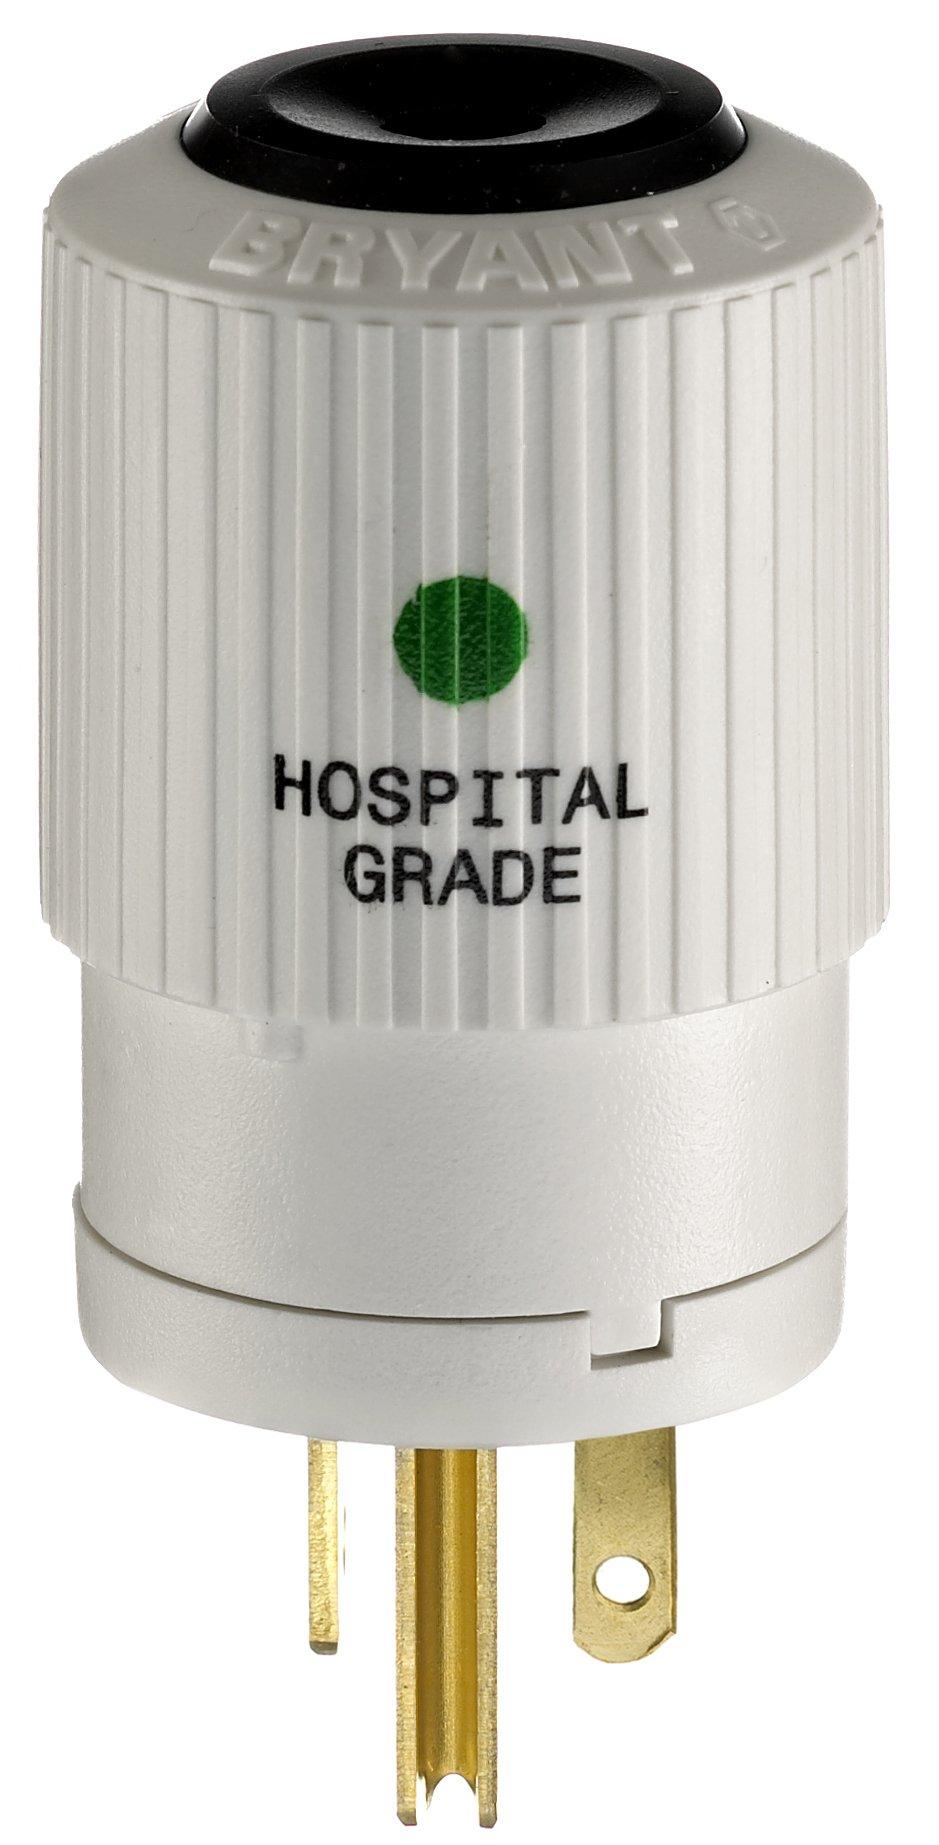 Bryant Electric BRY8366NP  Hospital Grade Straight Blade Plug, Grounding, NEMA 5-20P, 20 Amp, 125V, White